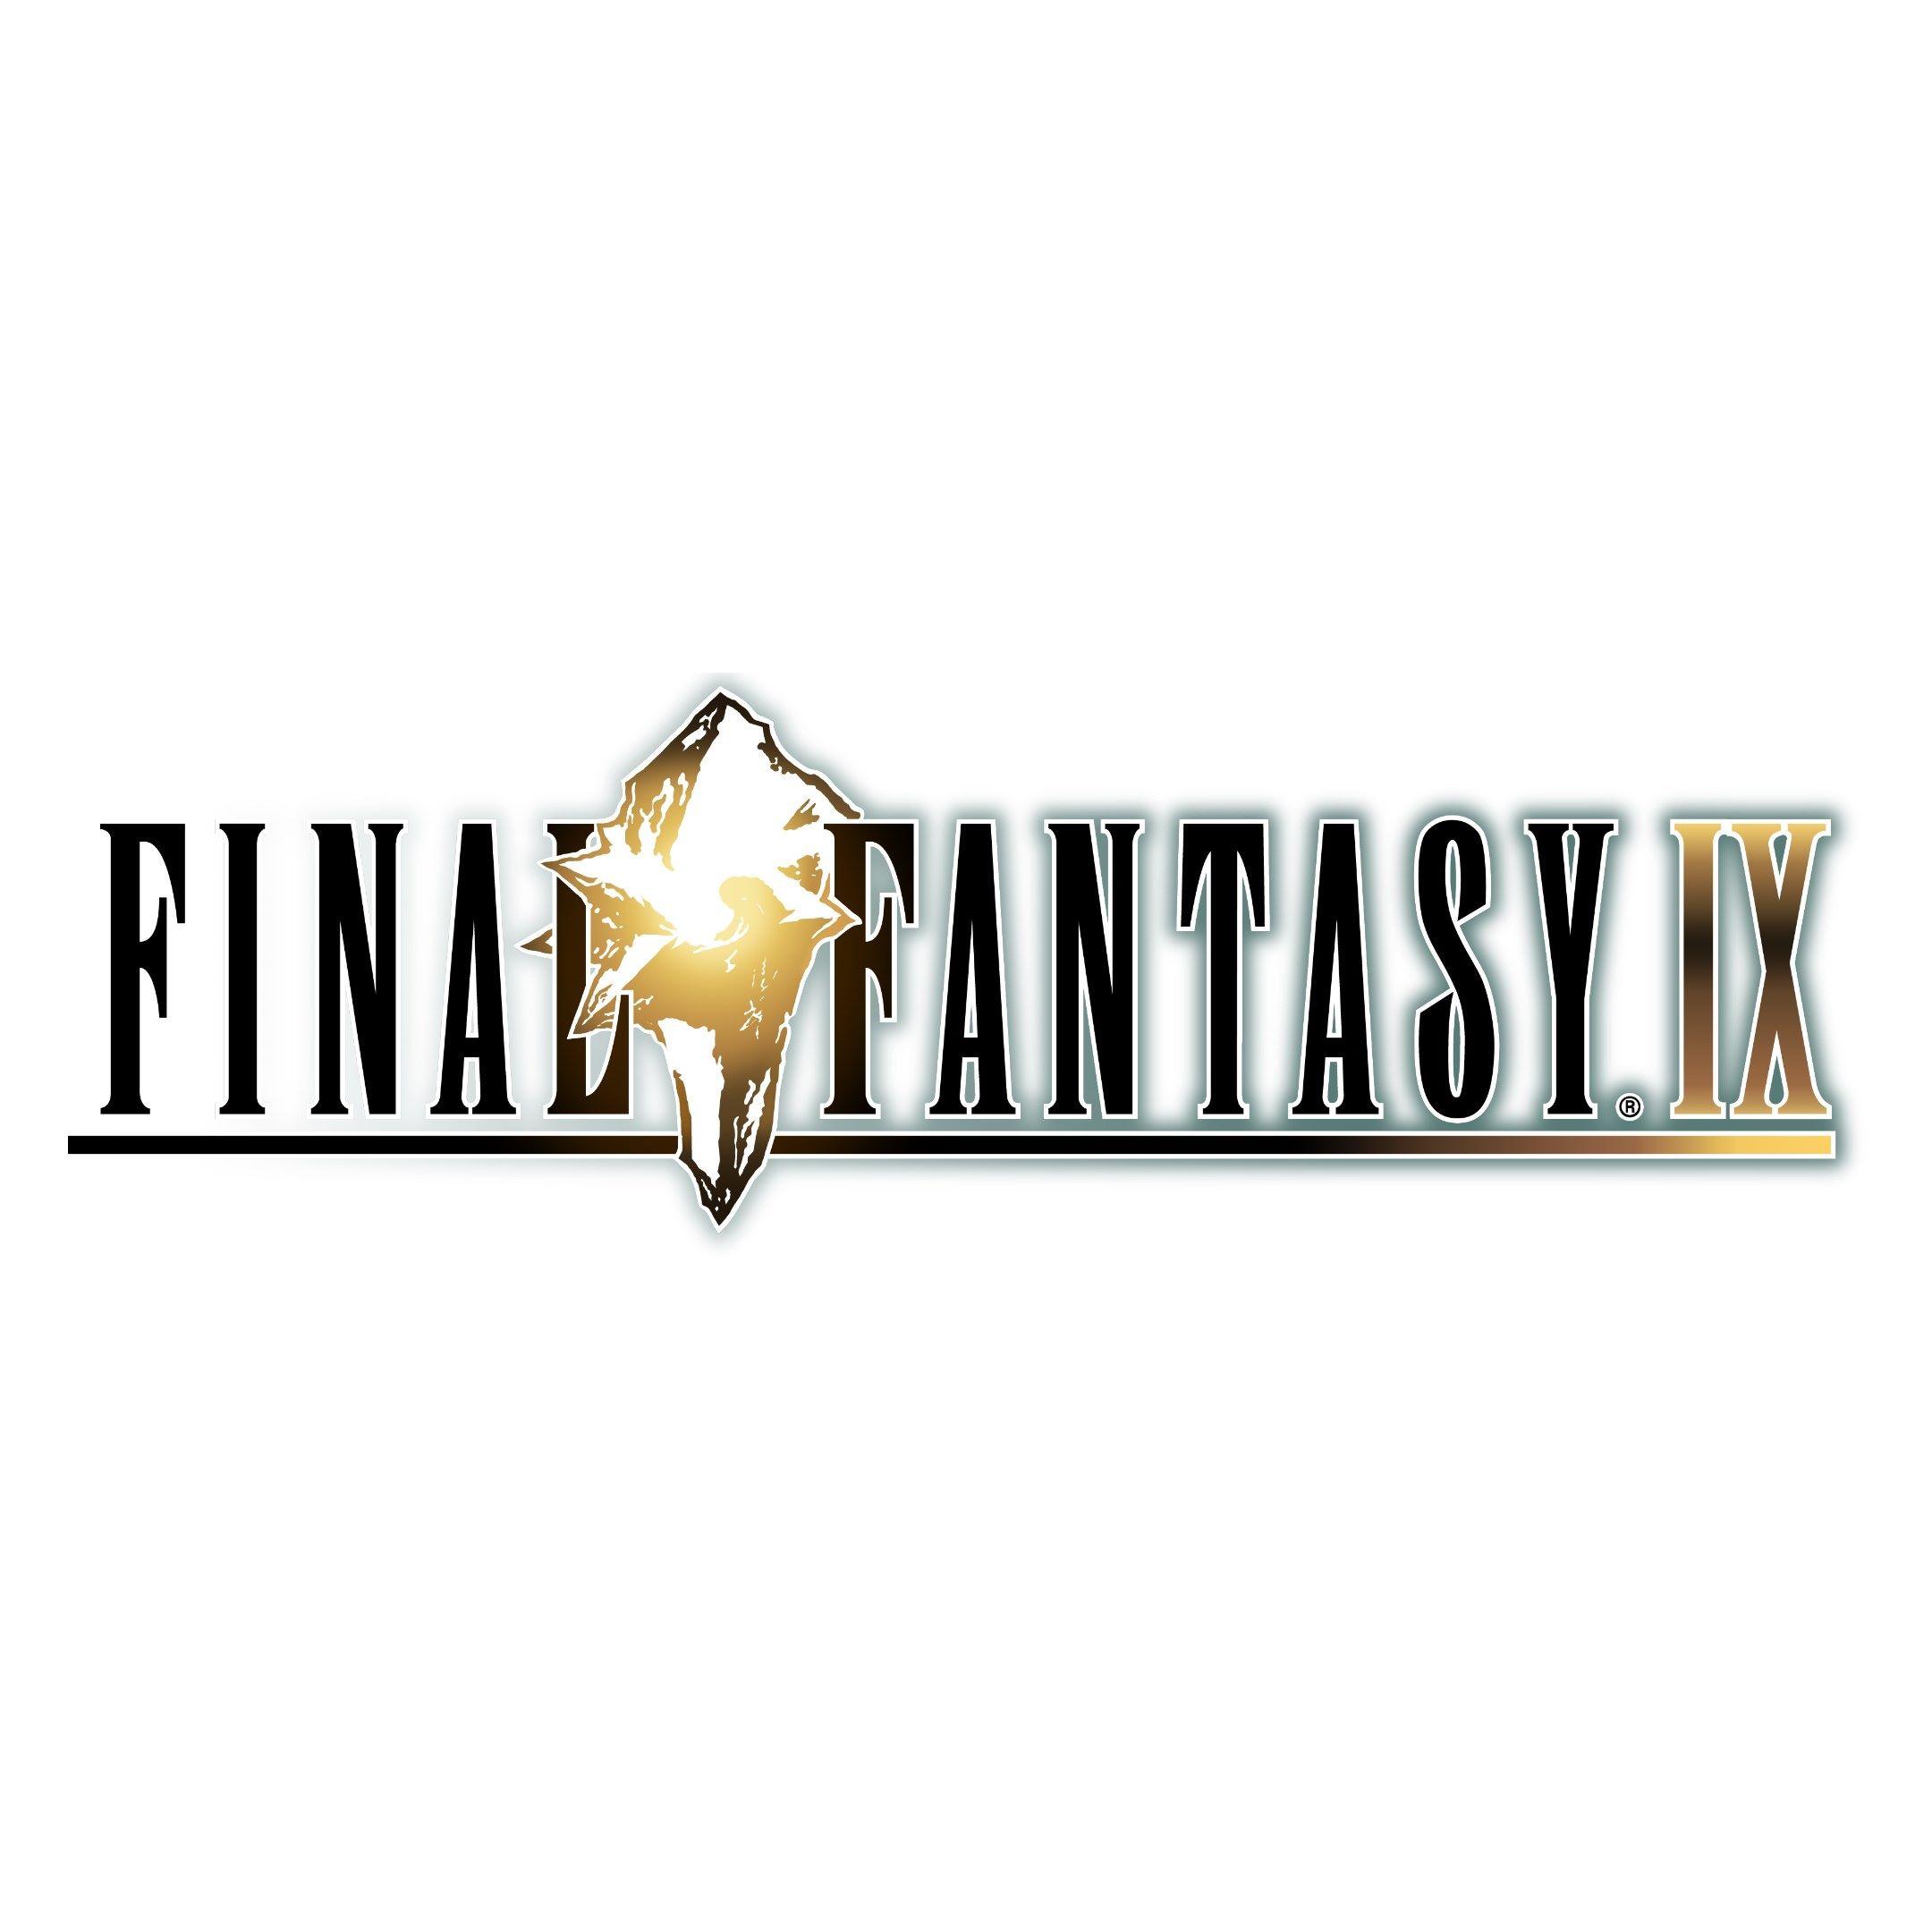 Final Fantasy IX achievements